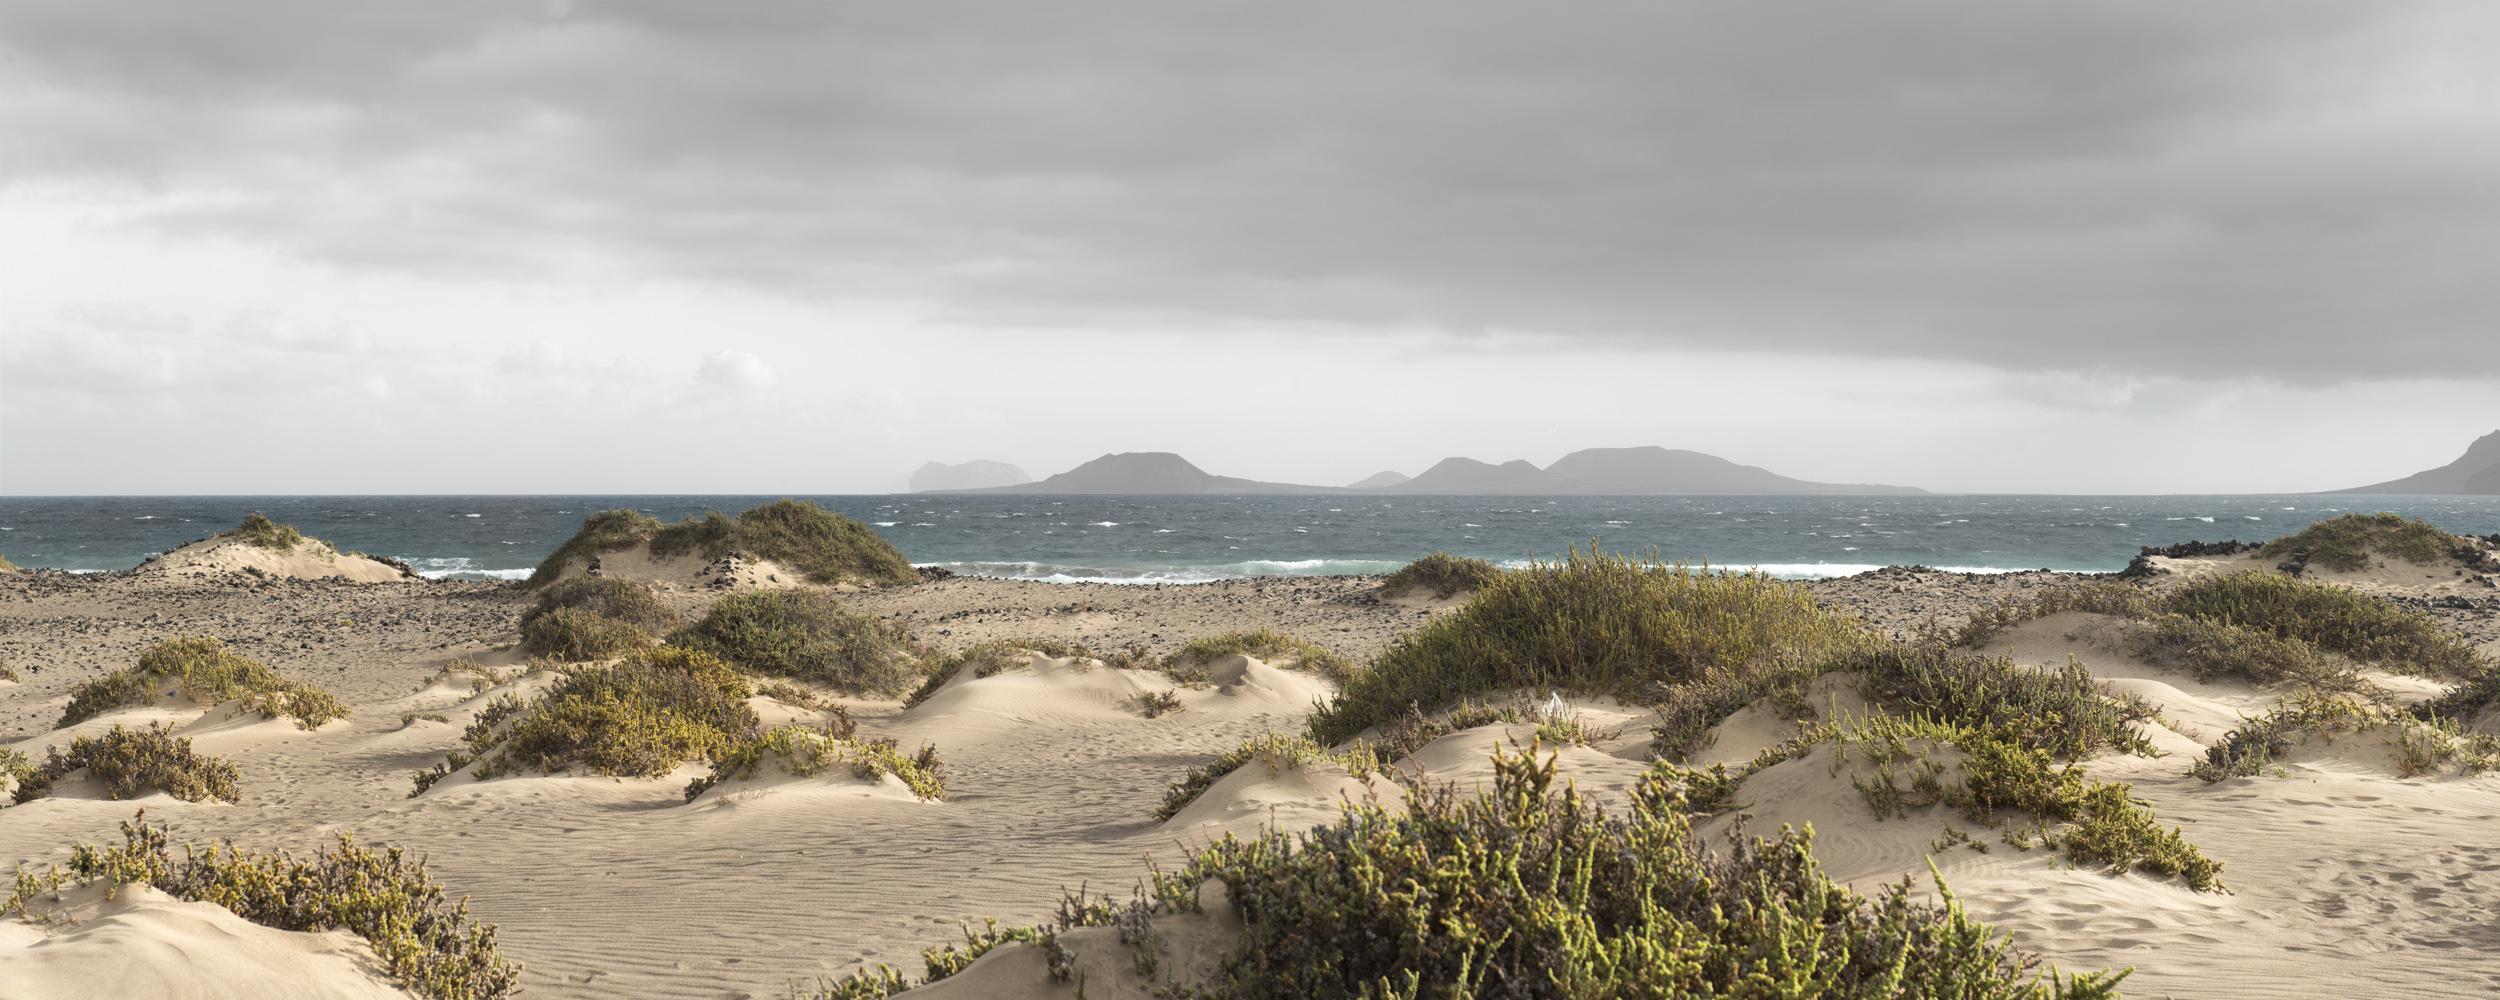 dear island - THE ISLAND OF THE HORIZON - cesar azcarate, fotografia